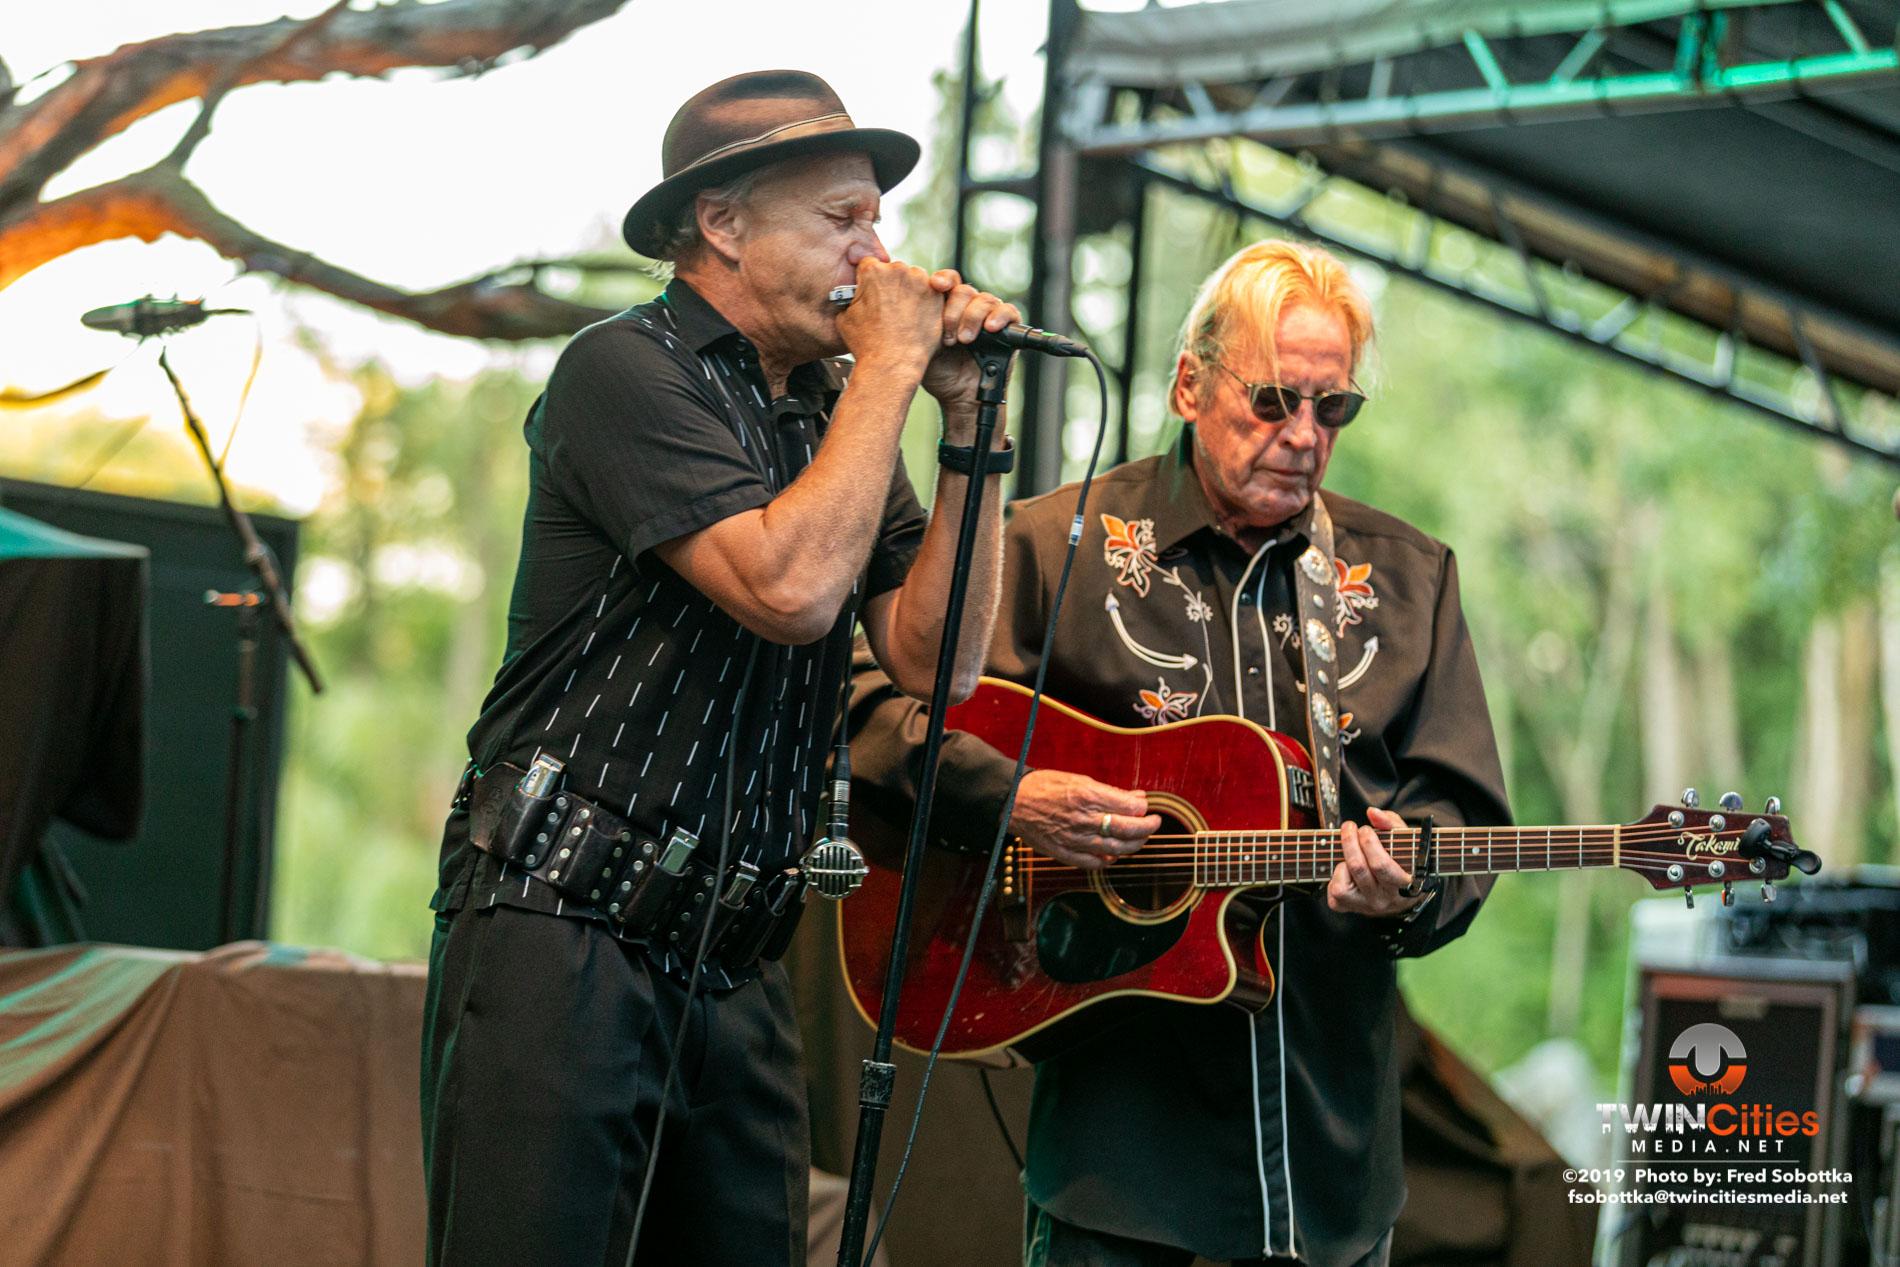 Paul-Metsa-and-Sonny-Earl-01